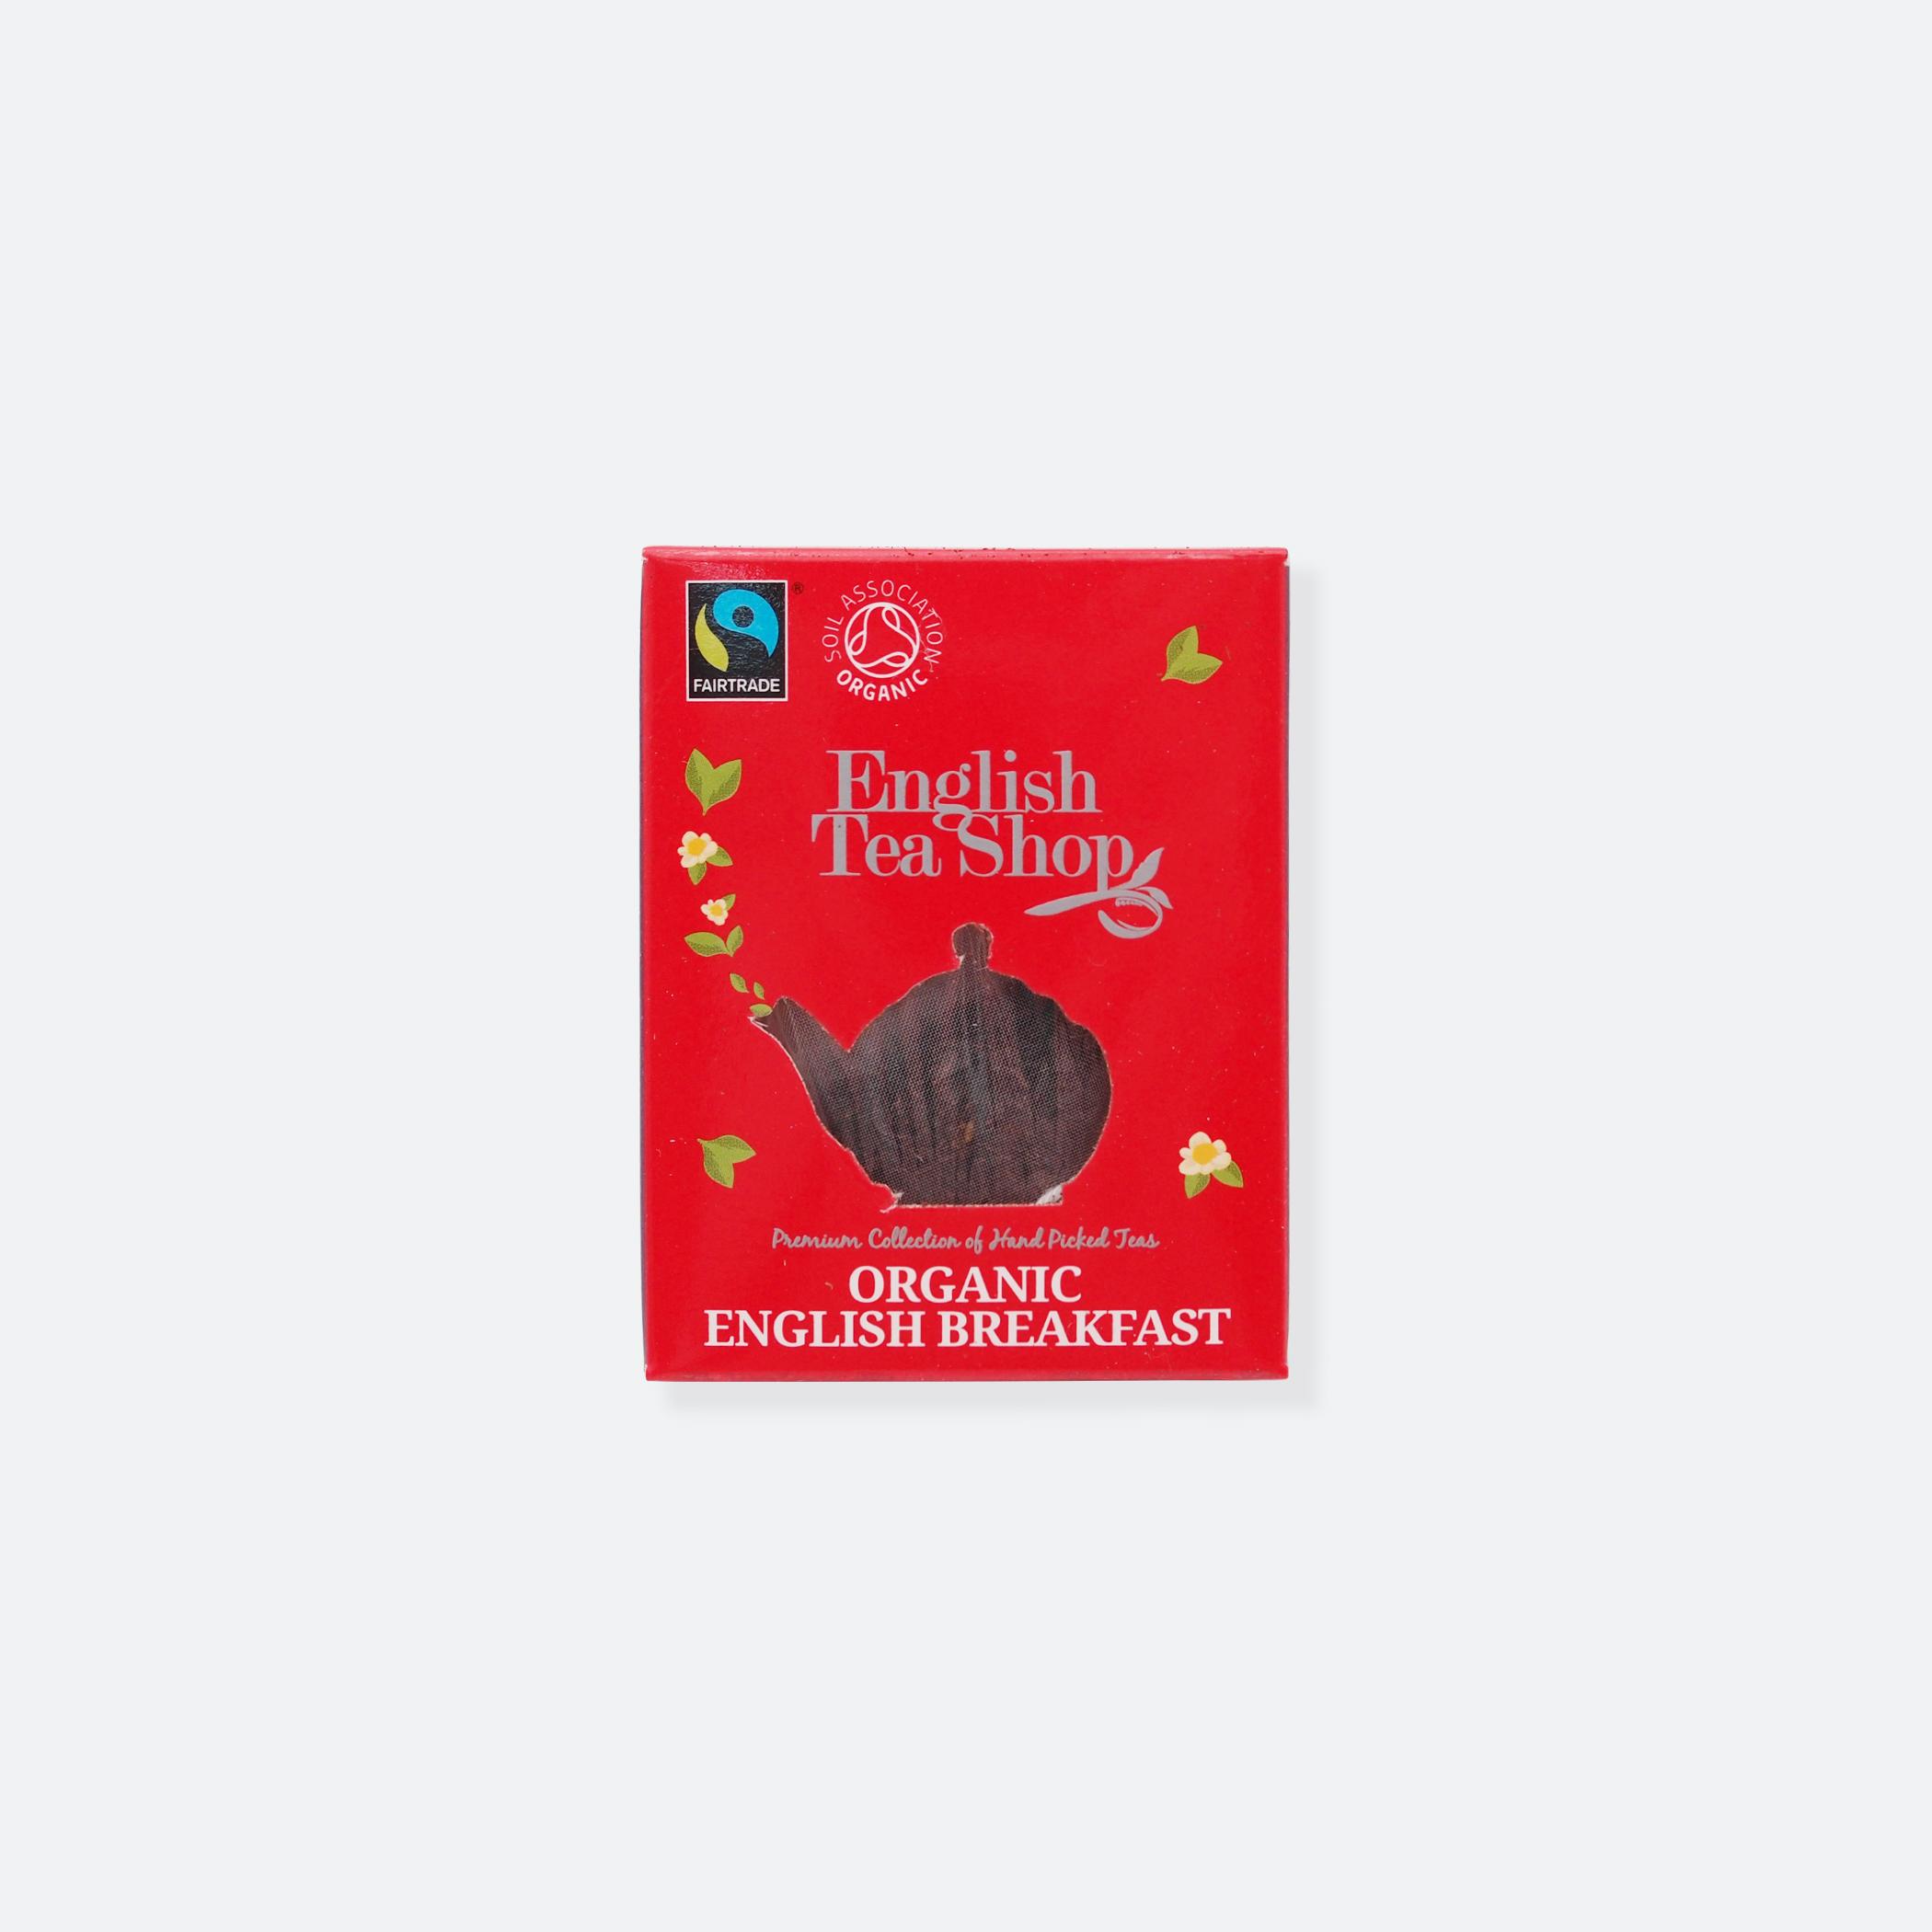 OhMart English Tea Shop - Organic English Breakfast 1